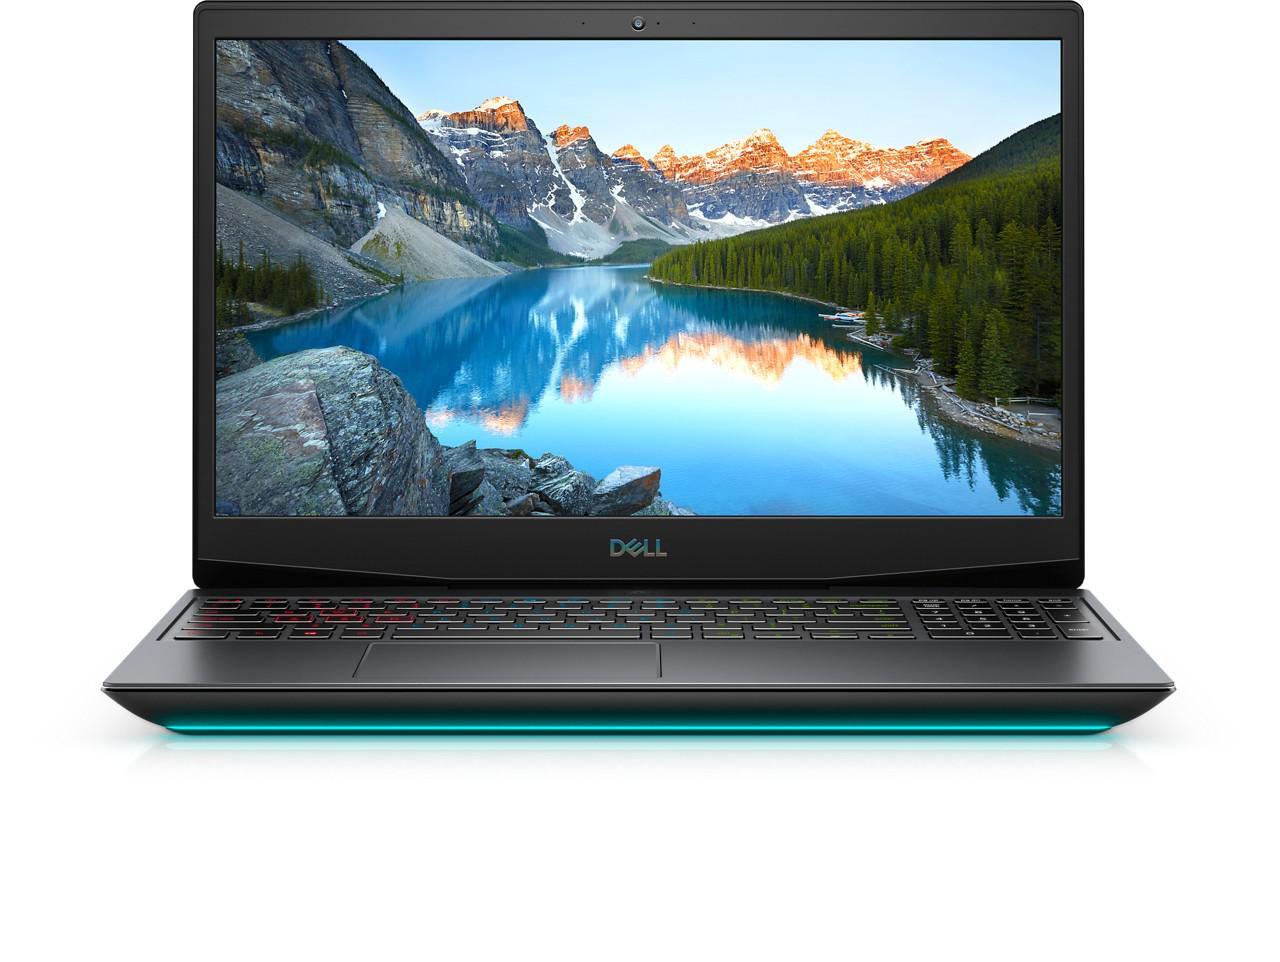 "Laptop Dell Inspiron Gaming 5500 G5, 15.6"" FHD, i7-10750H, 16GB, 1TB SSD, GeForce GTX 1660TI, Ubuntu - imaginea 1"